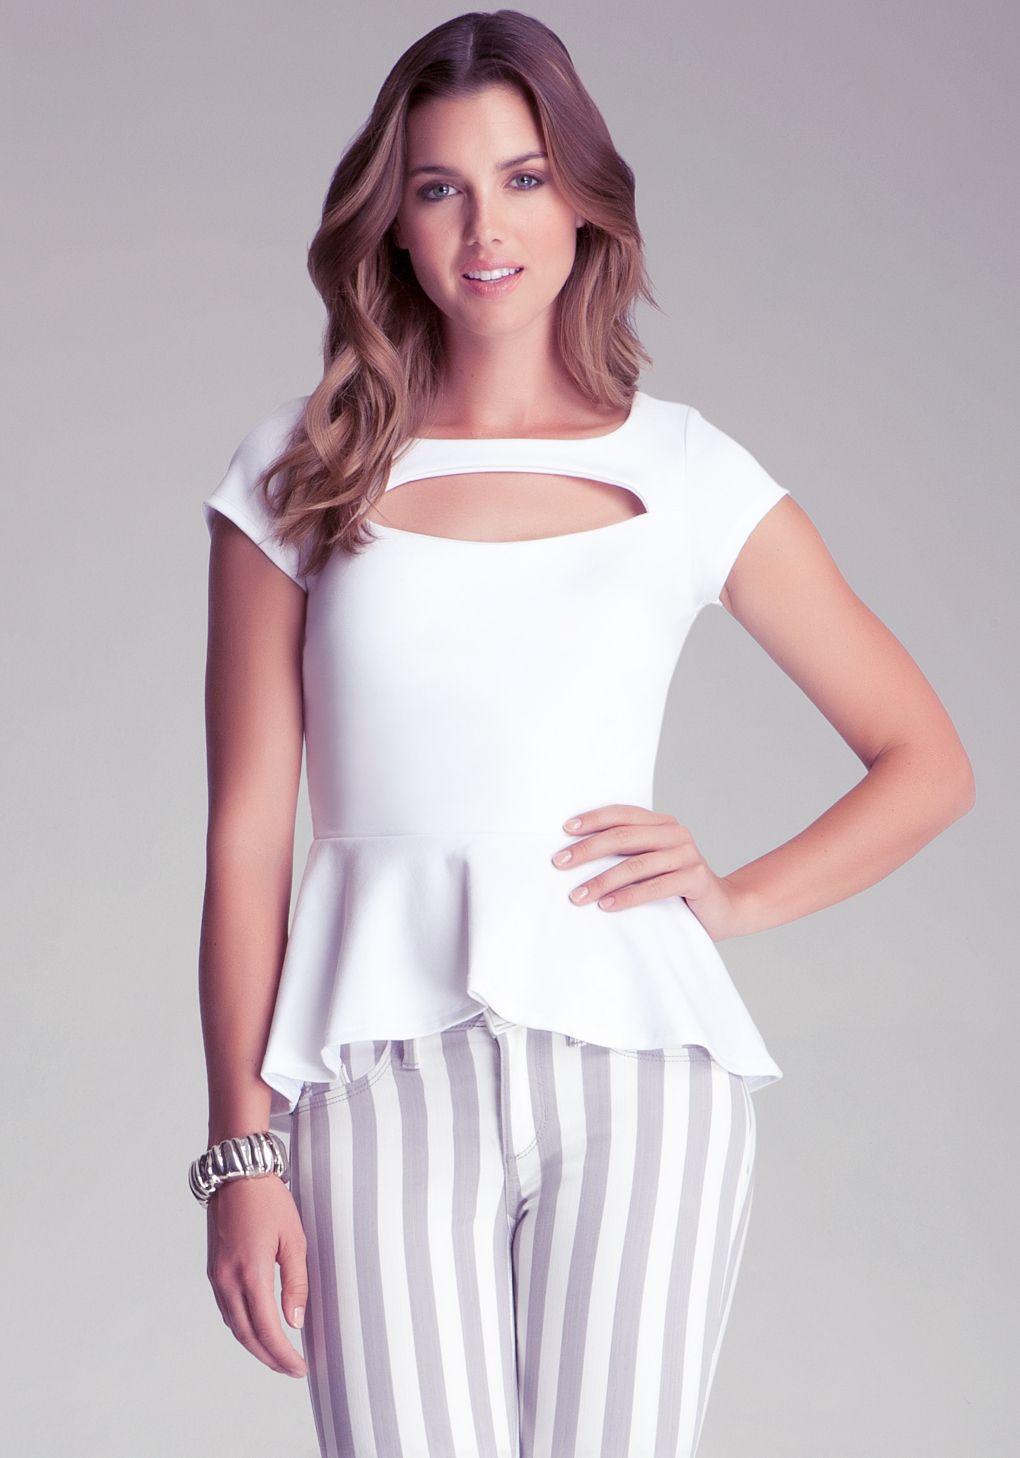 33ed3b978d Bebe Peekaboo Peplum Top in White   Lyst   Tops   Fashion, Tops, Peplum